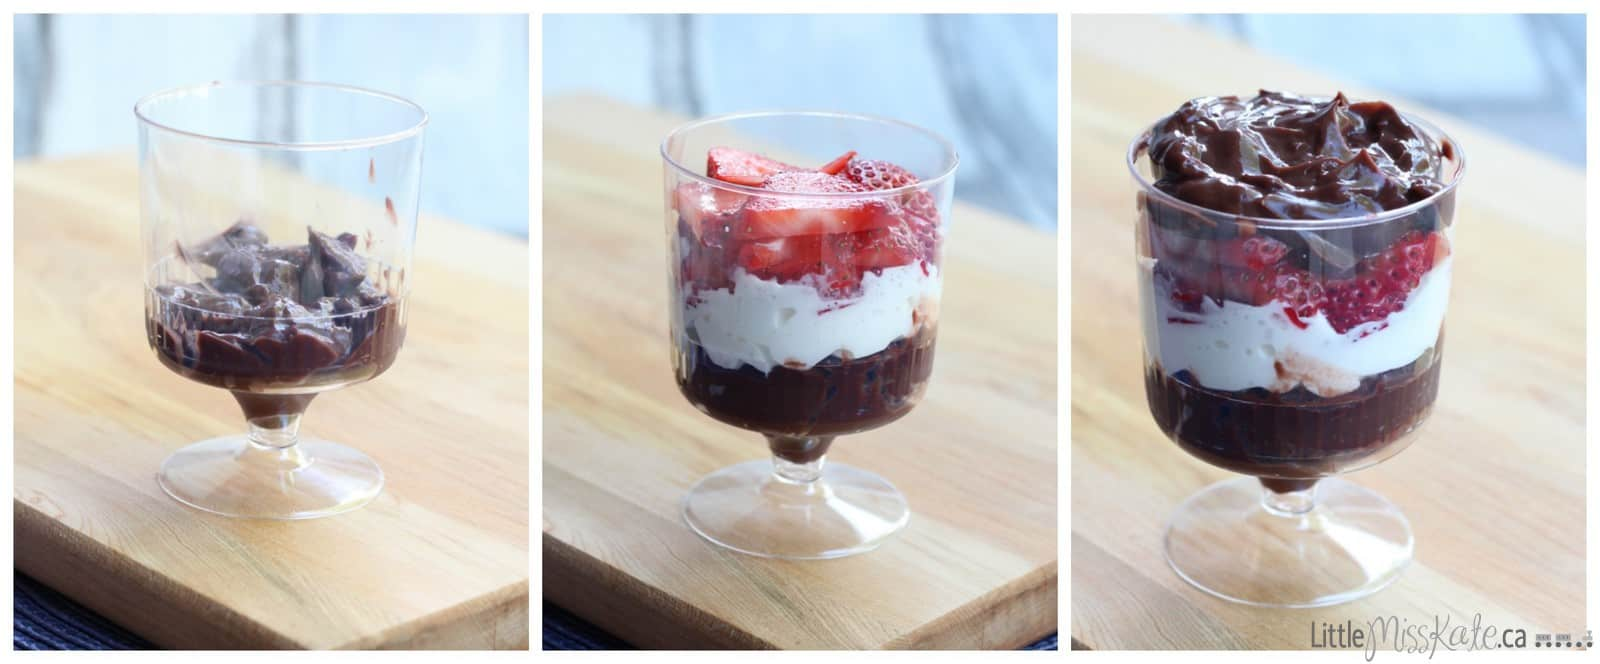 Easy Strawberry Chocolate Pudding Parfait Recipe via LittleMissKate.ca